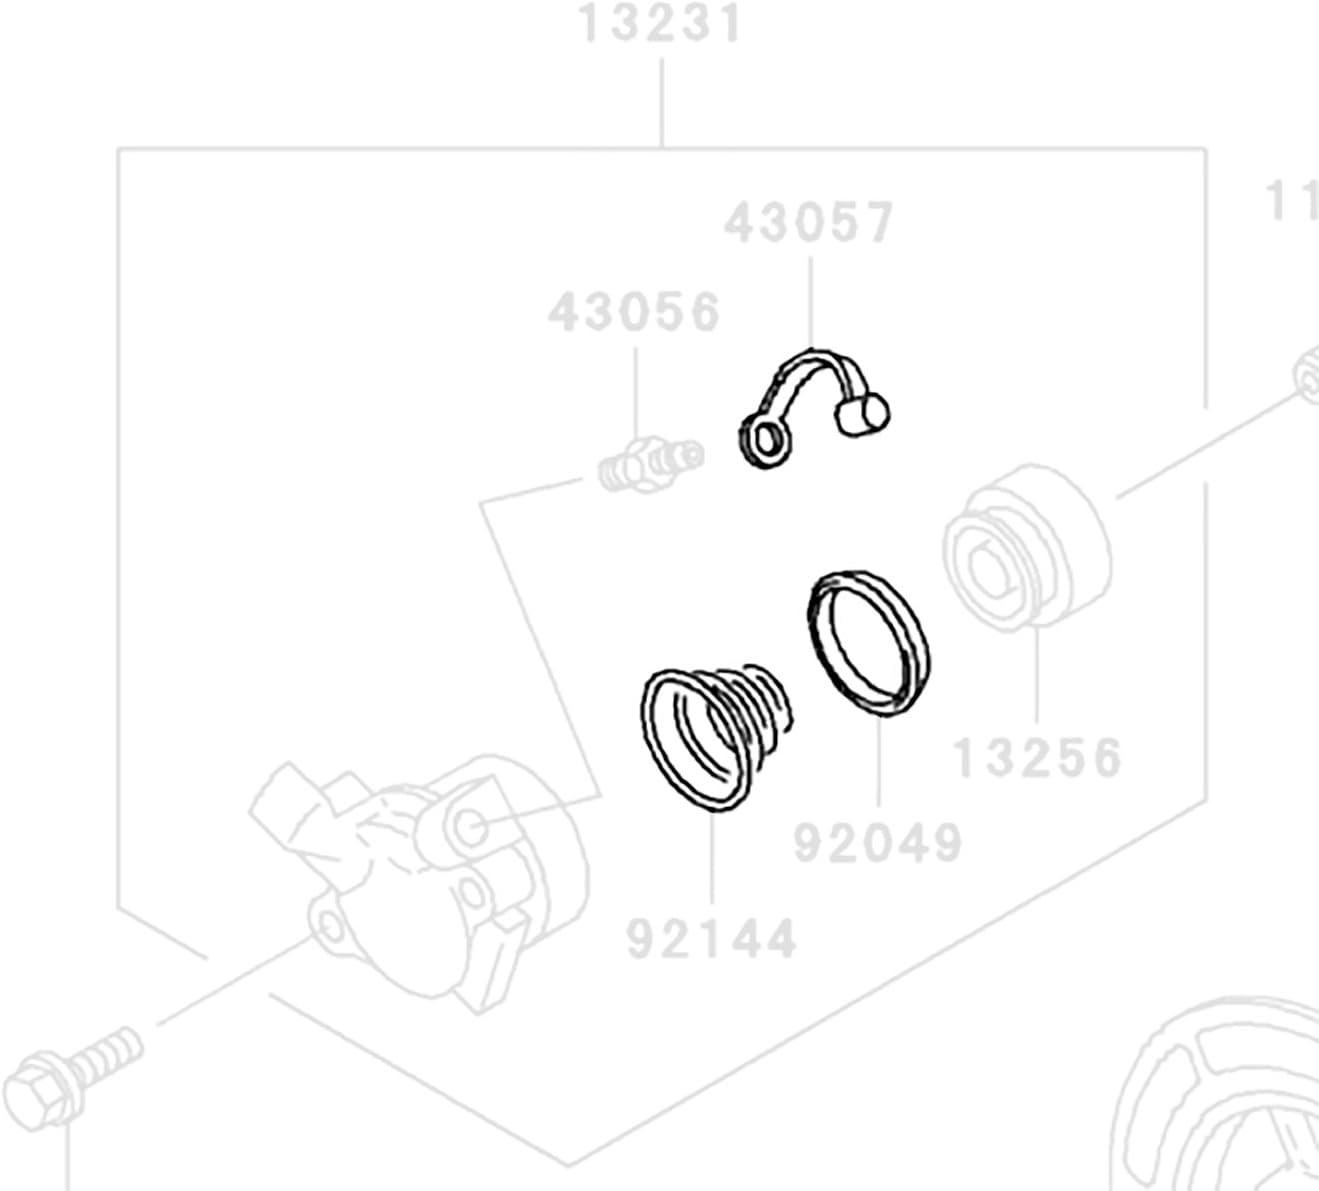 DP 0108-007 Clutch Slave Cylinder Rebuild Repair Parts Kit Fits Kawasaki Triumph